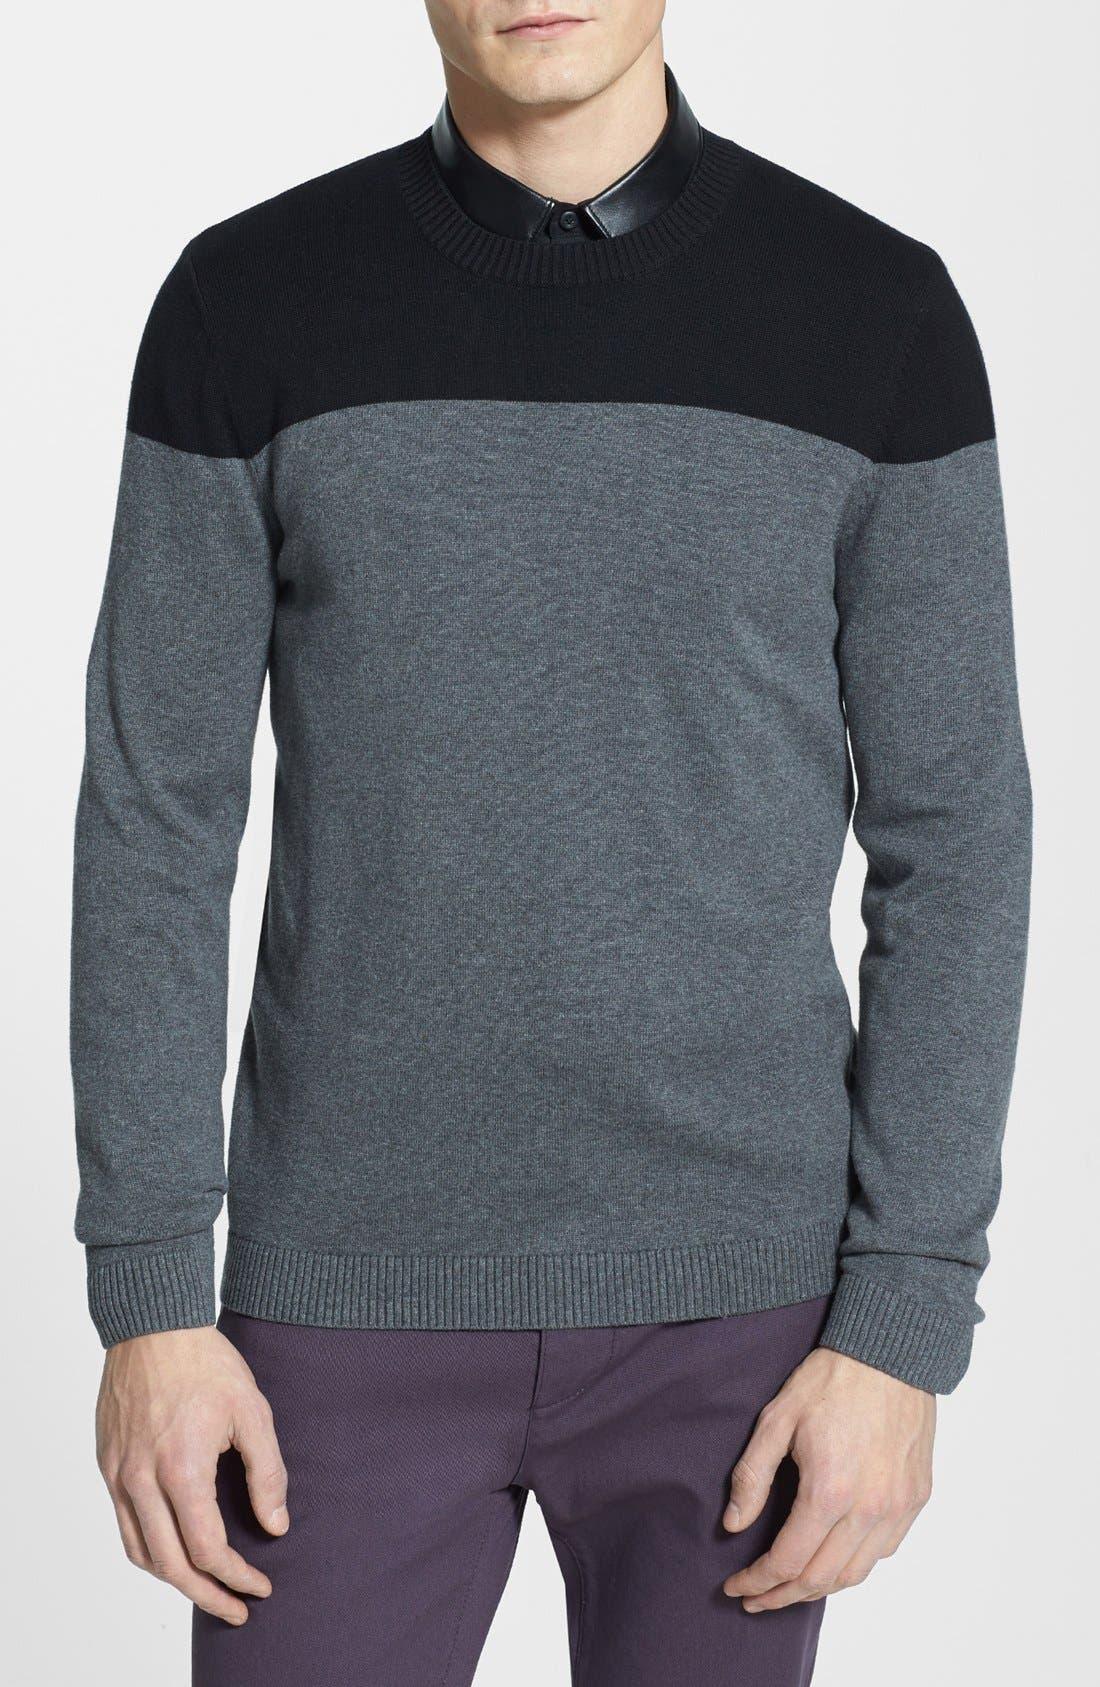 Alternate Image 1 Selected - Topman Two-Tone Panel Crewneck Sweater